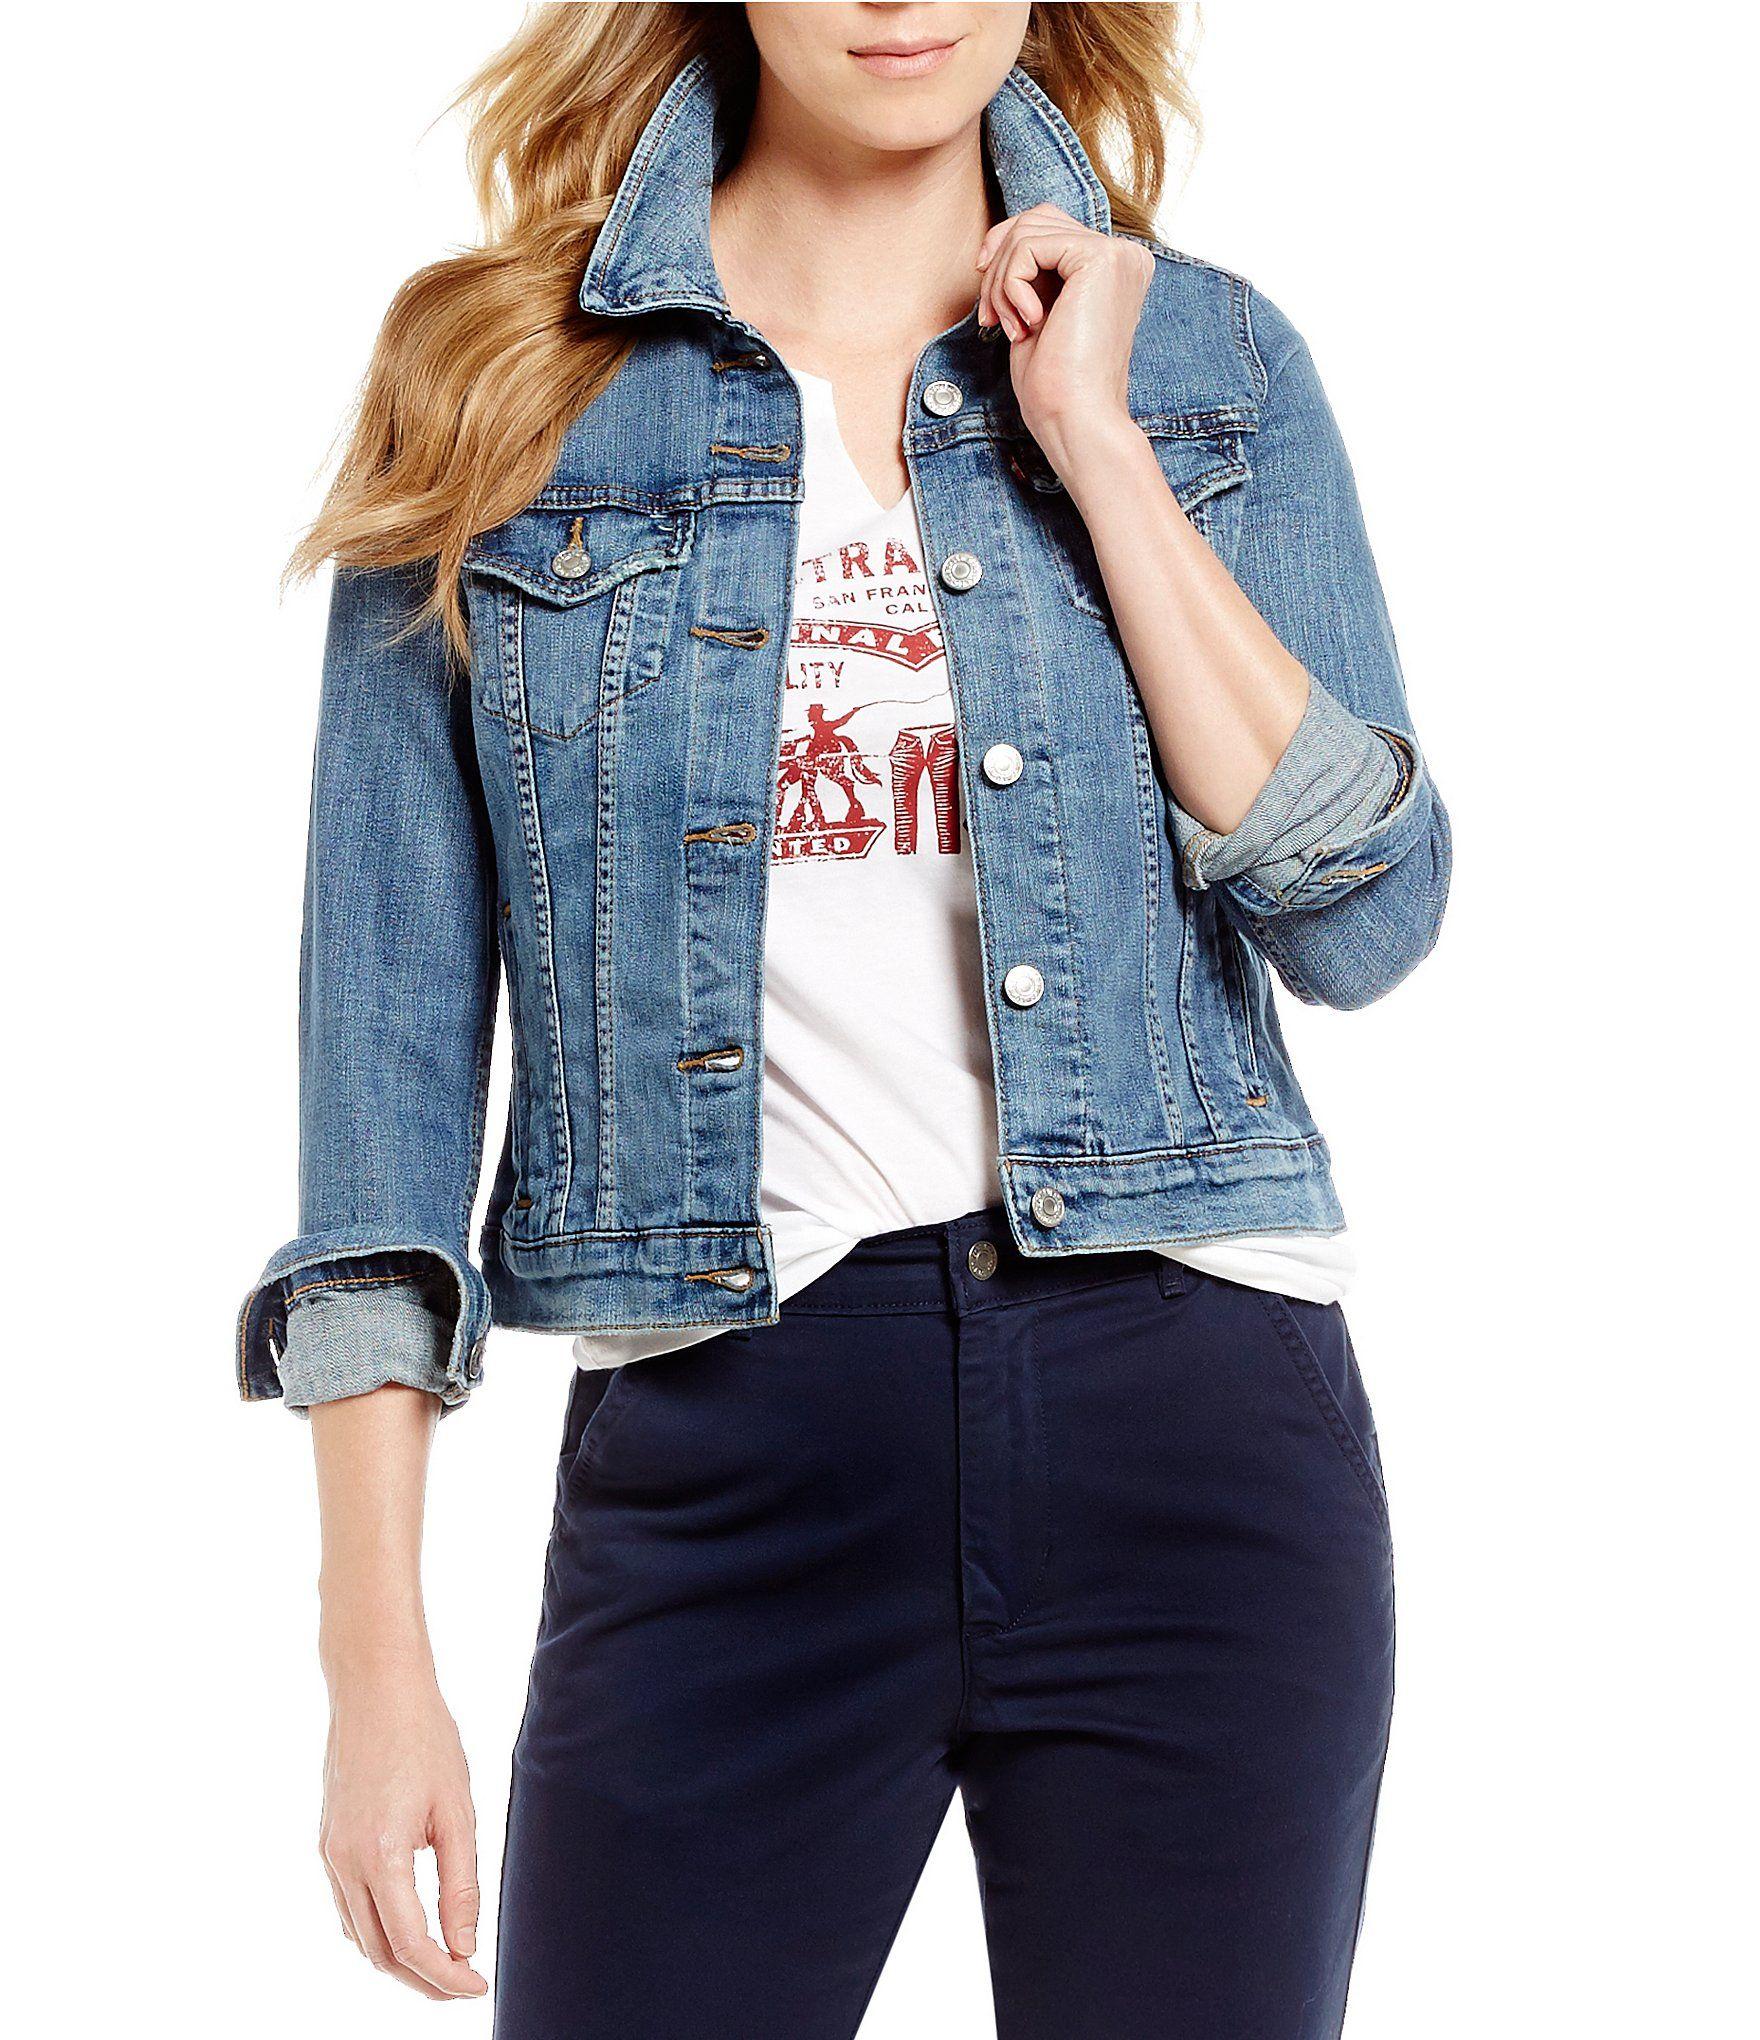 Levi S Original Trucker Jacket Dillard S Denim Jacket Blue Jean Jacket Outfits Womens Fashion Jackets [ 2040 x 1760 Pixel ]